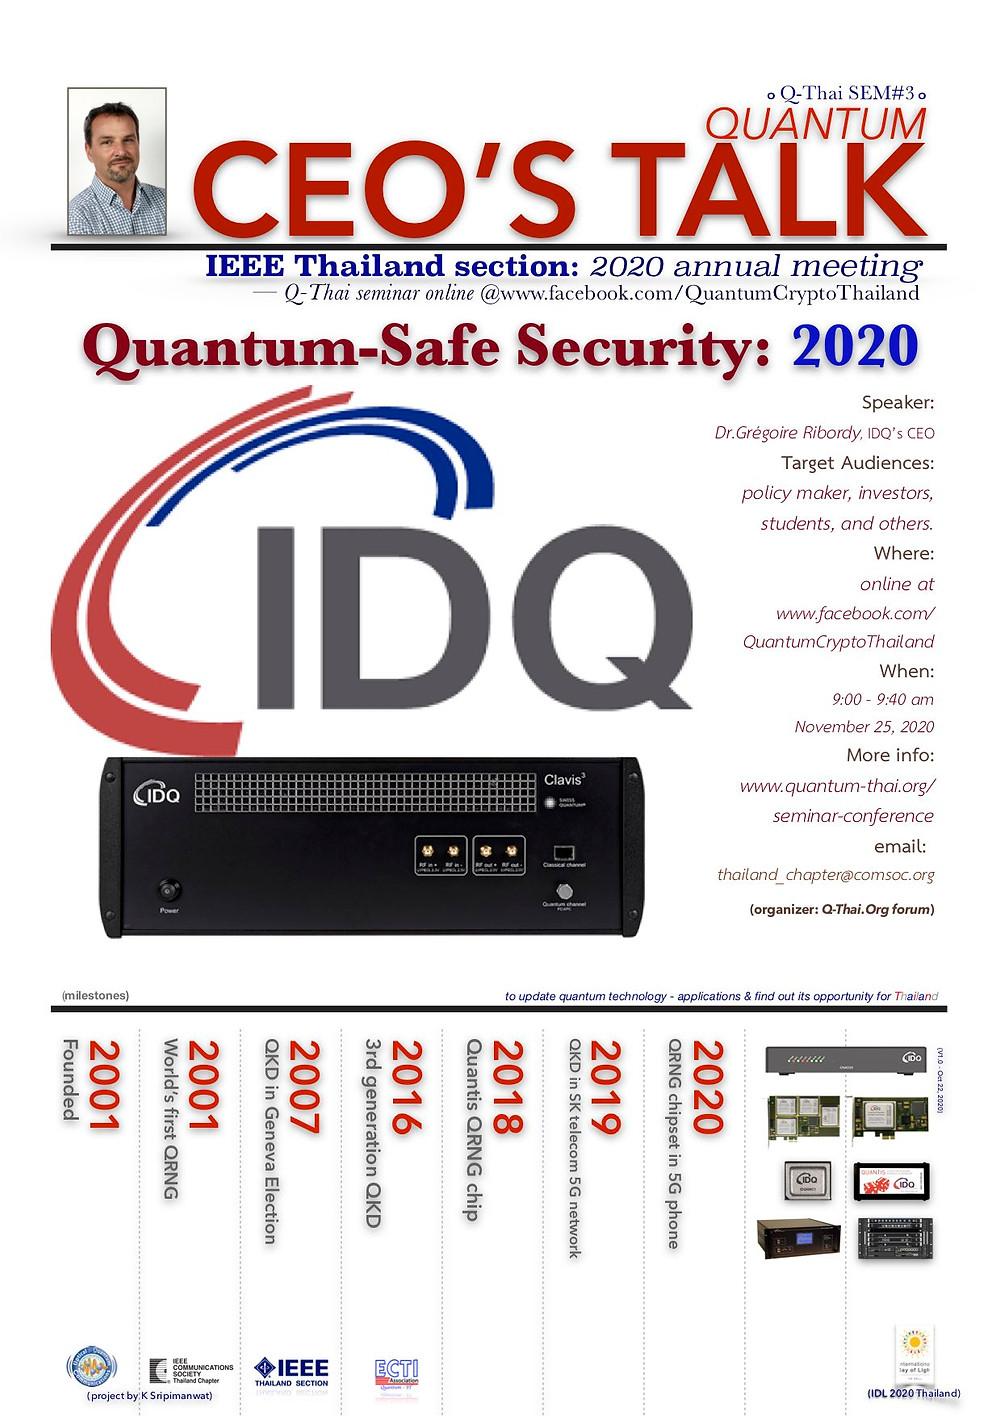 "Quantum - CEO's Talk: Quantum Information Technology for communications security, Thai quantum seminar #3 - ""Quantum - Safe Security 2020"" by Dr.Grégoire Ribordy, IDQ's CEO, online - 9:00 - 9:40 am Nov 25, 2020 at FB/QuantumCryotpThailand"